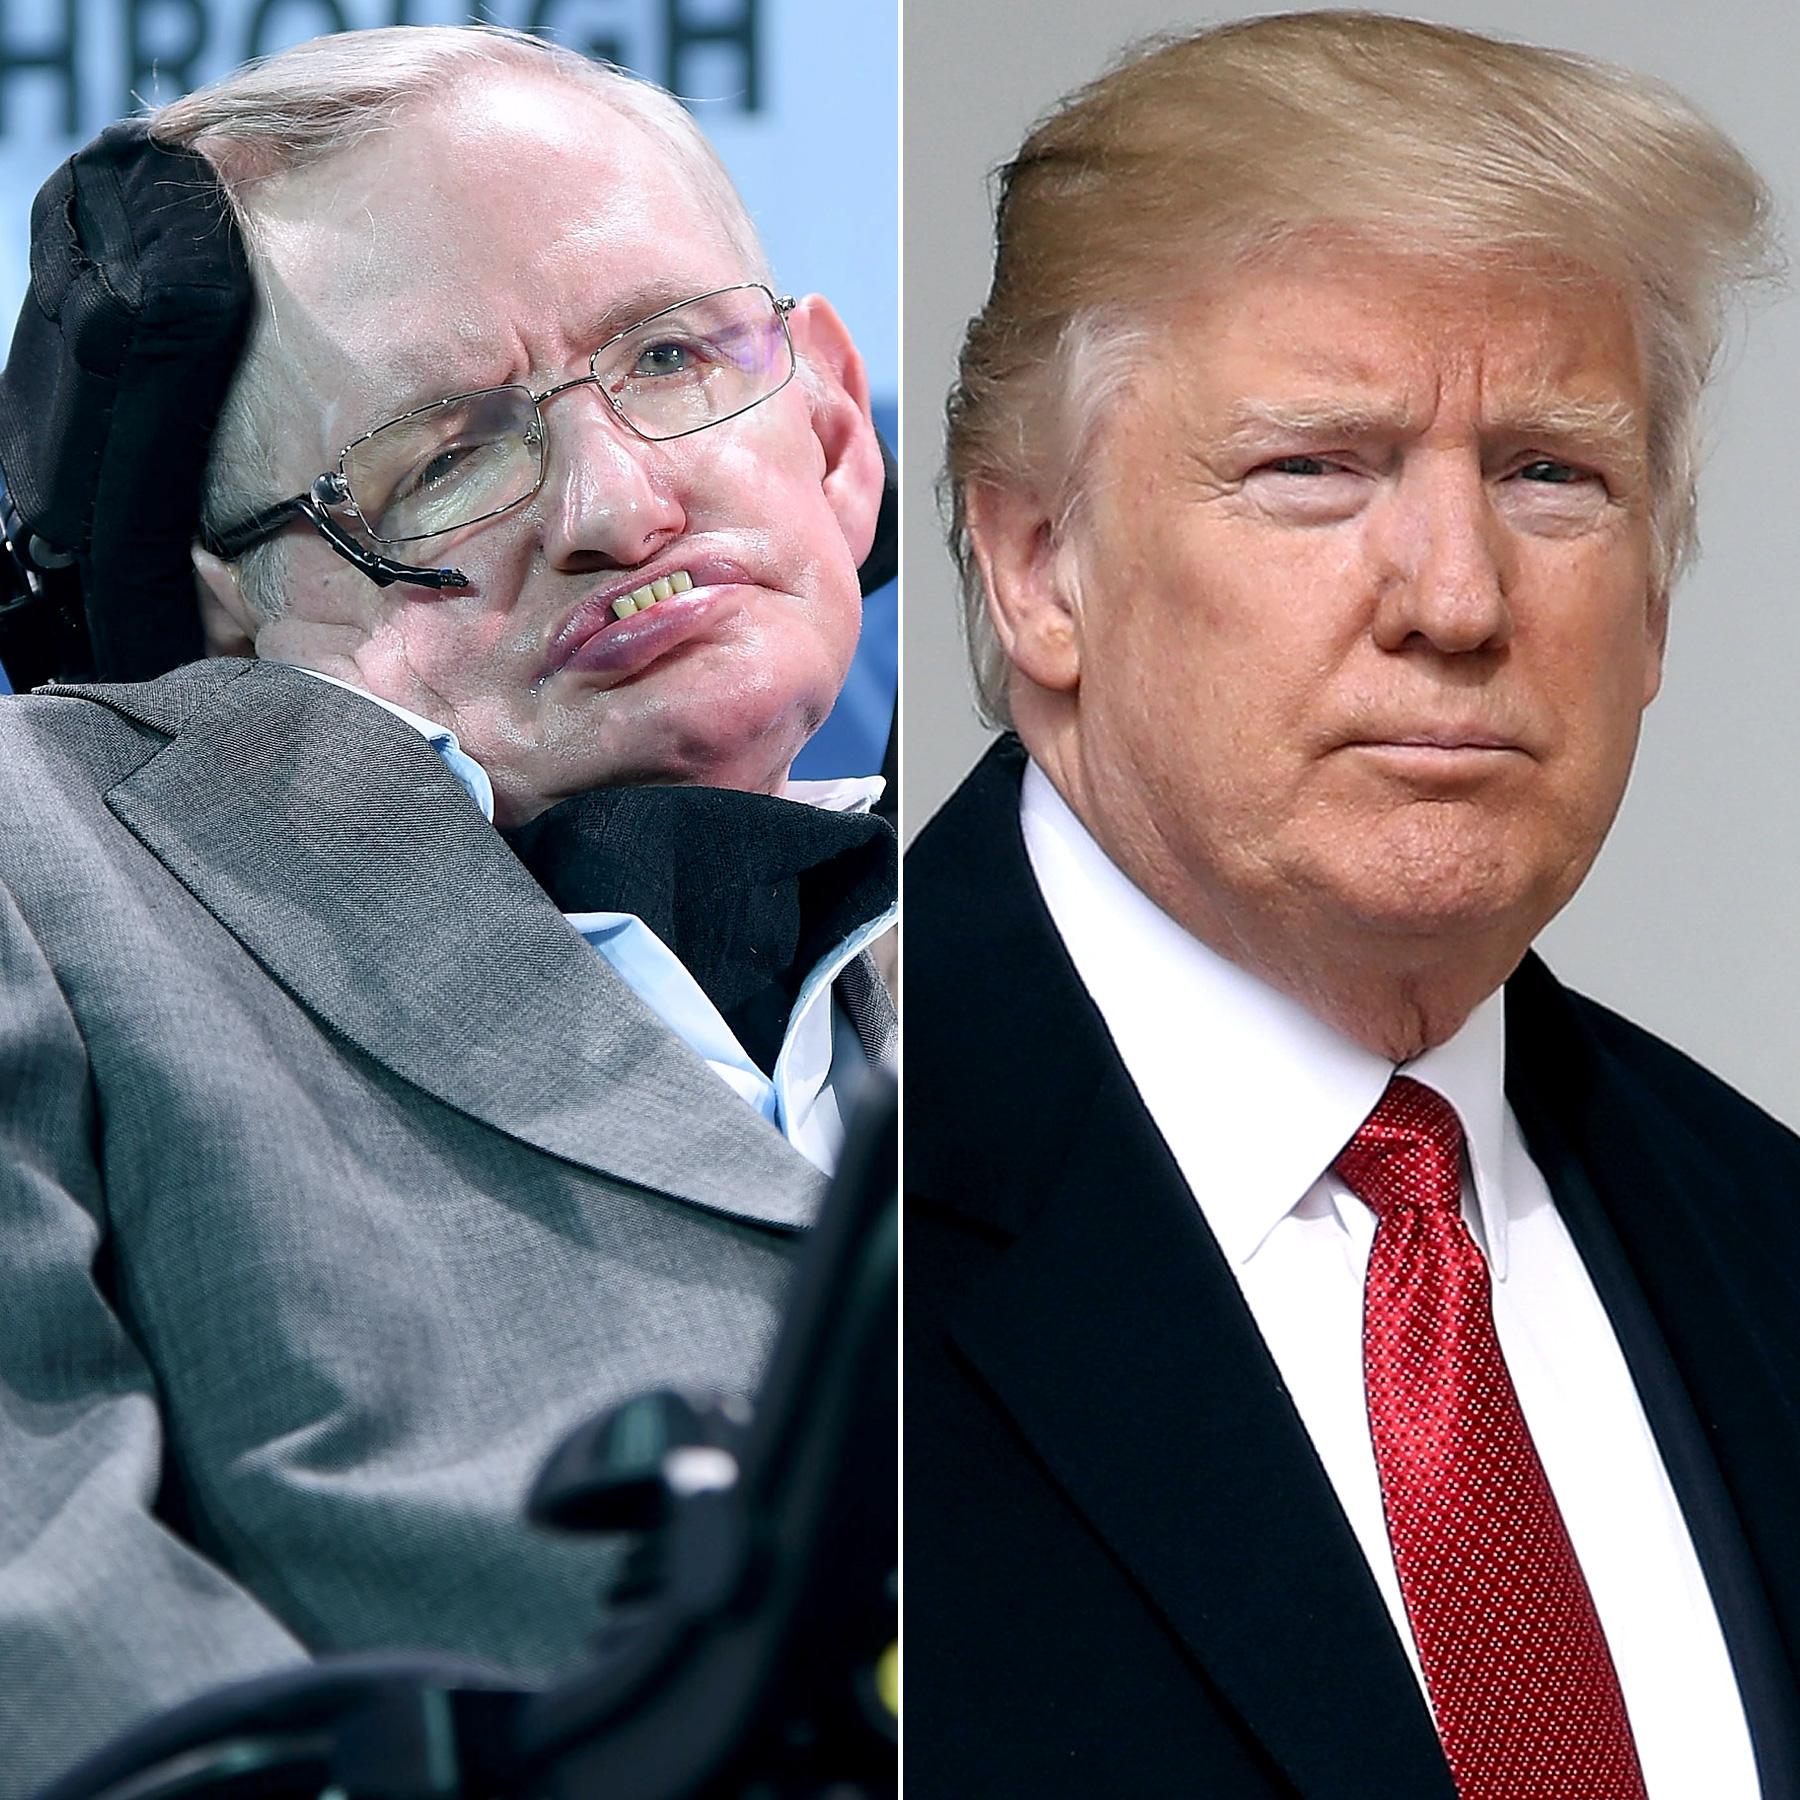 Stephen Hawking and Donald Trump